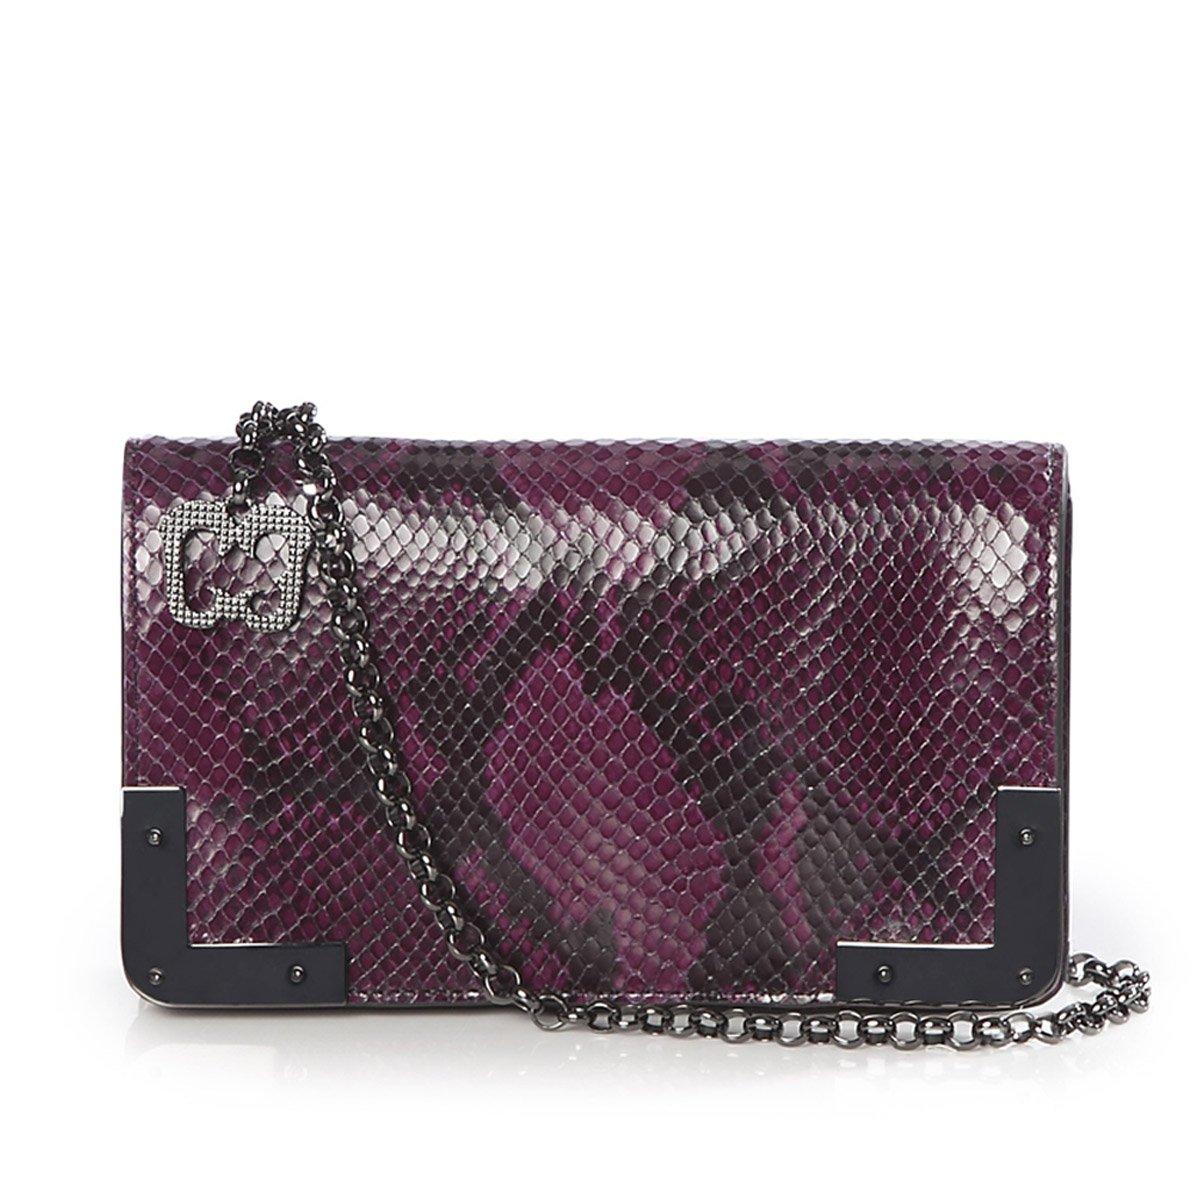 Eric Javits Luxury Fashion Designer Women's Handbag - Cassidy - Plum